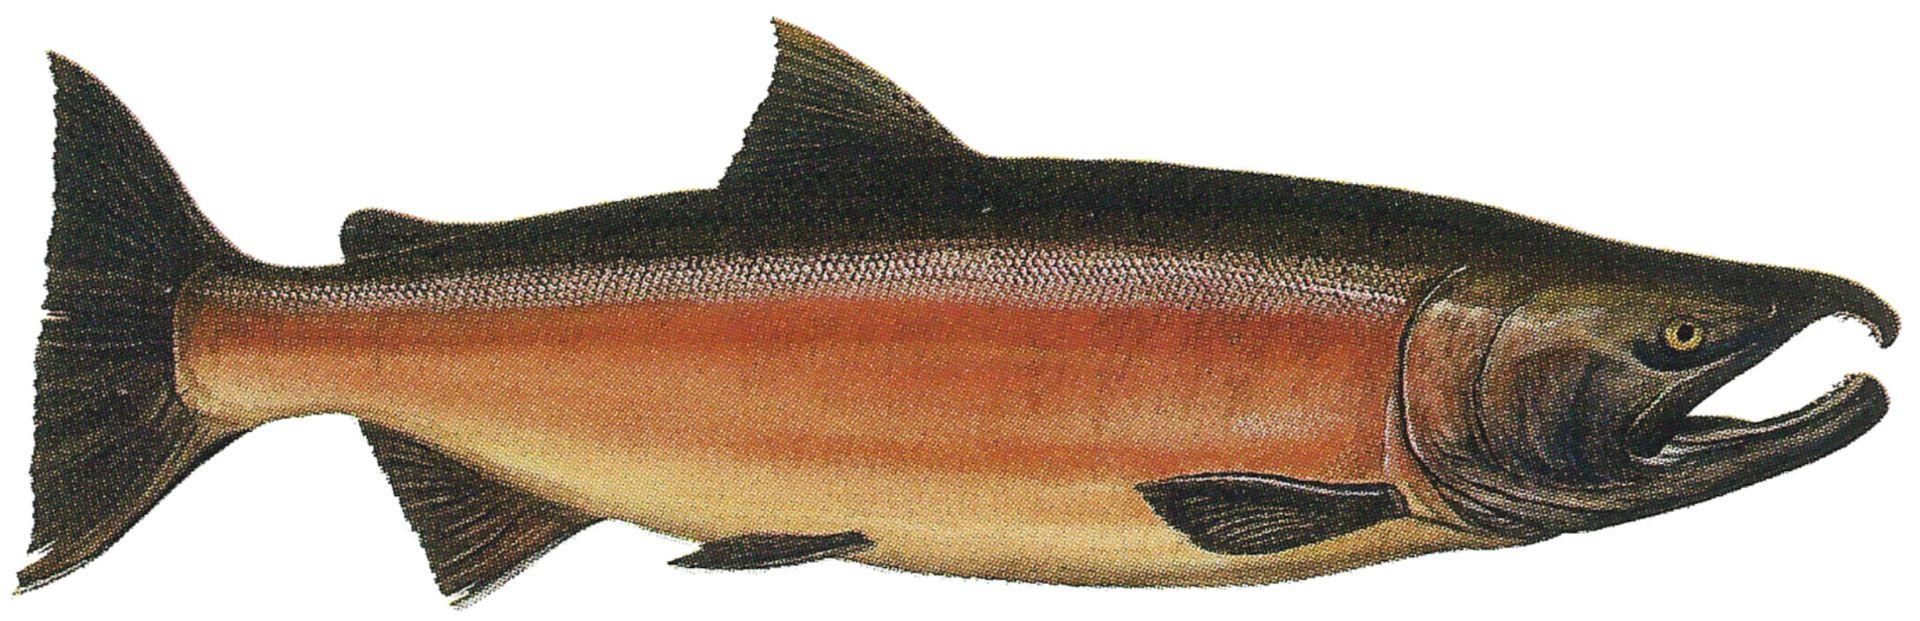 Silver Salmon, Coho, Fishing Kenai